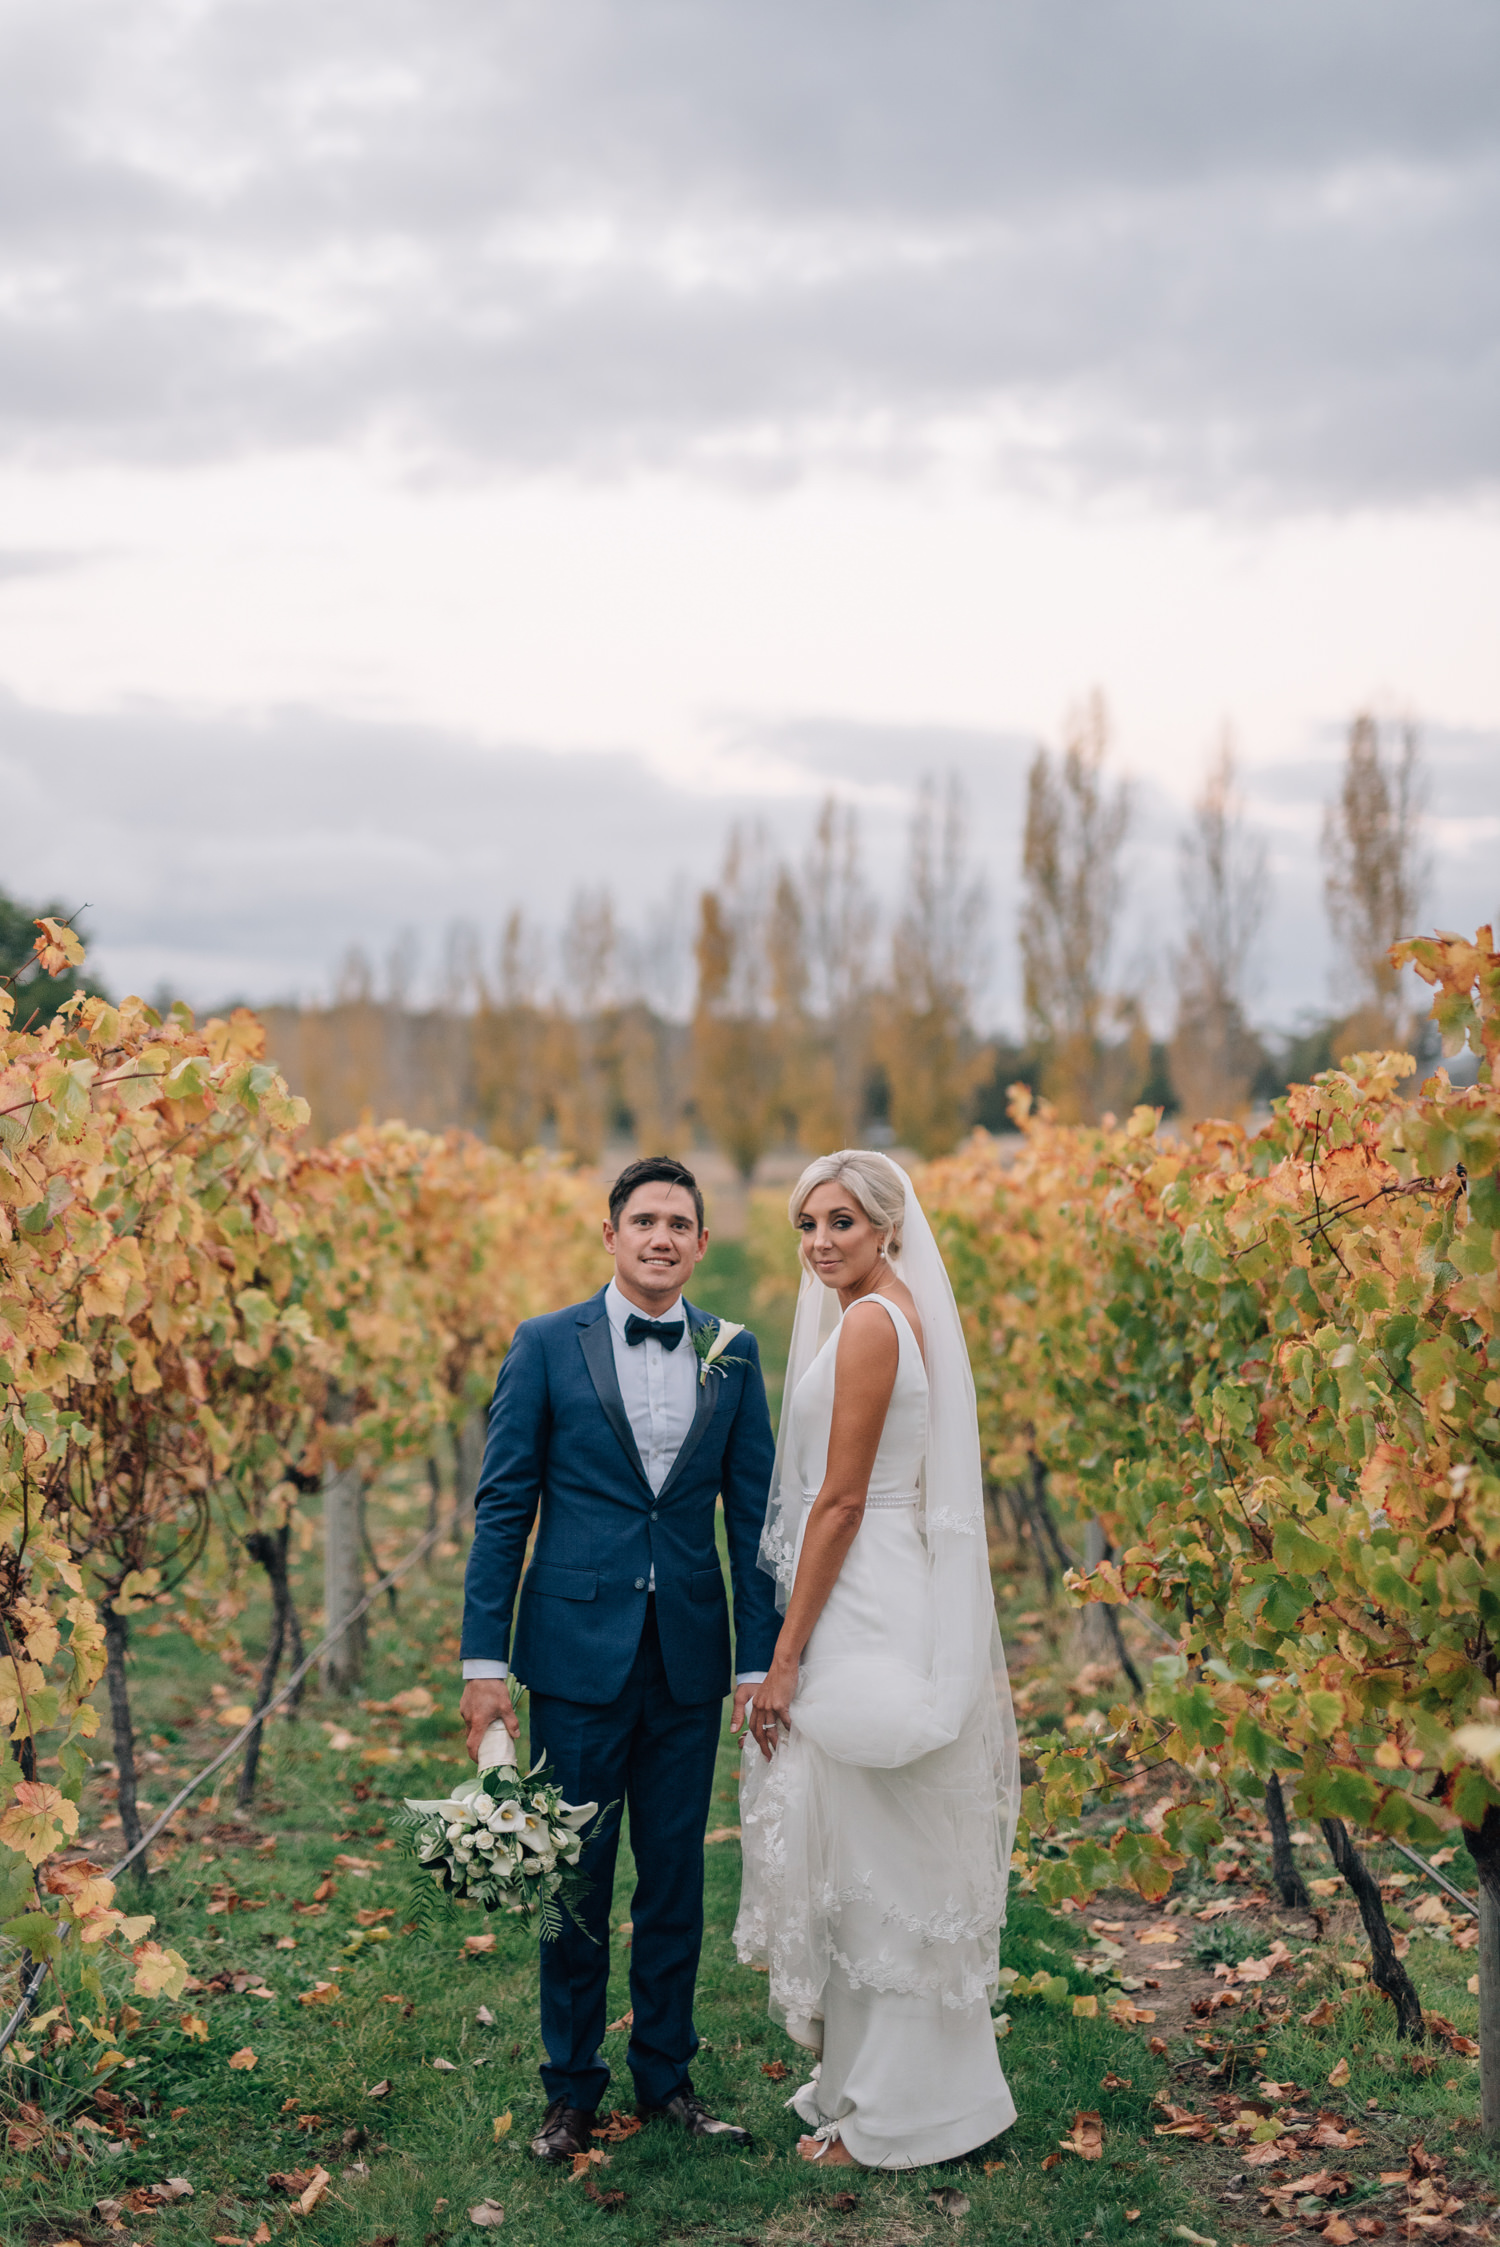 Entally-House-Wedding-Photographer-87.jpg